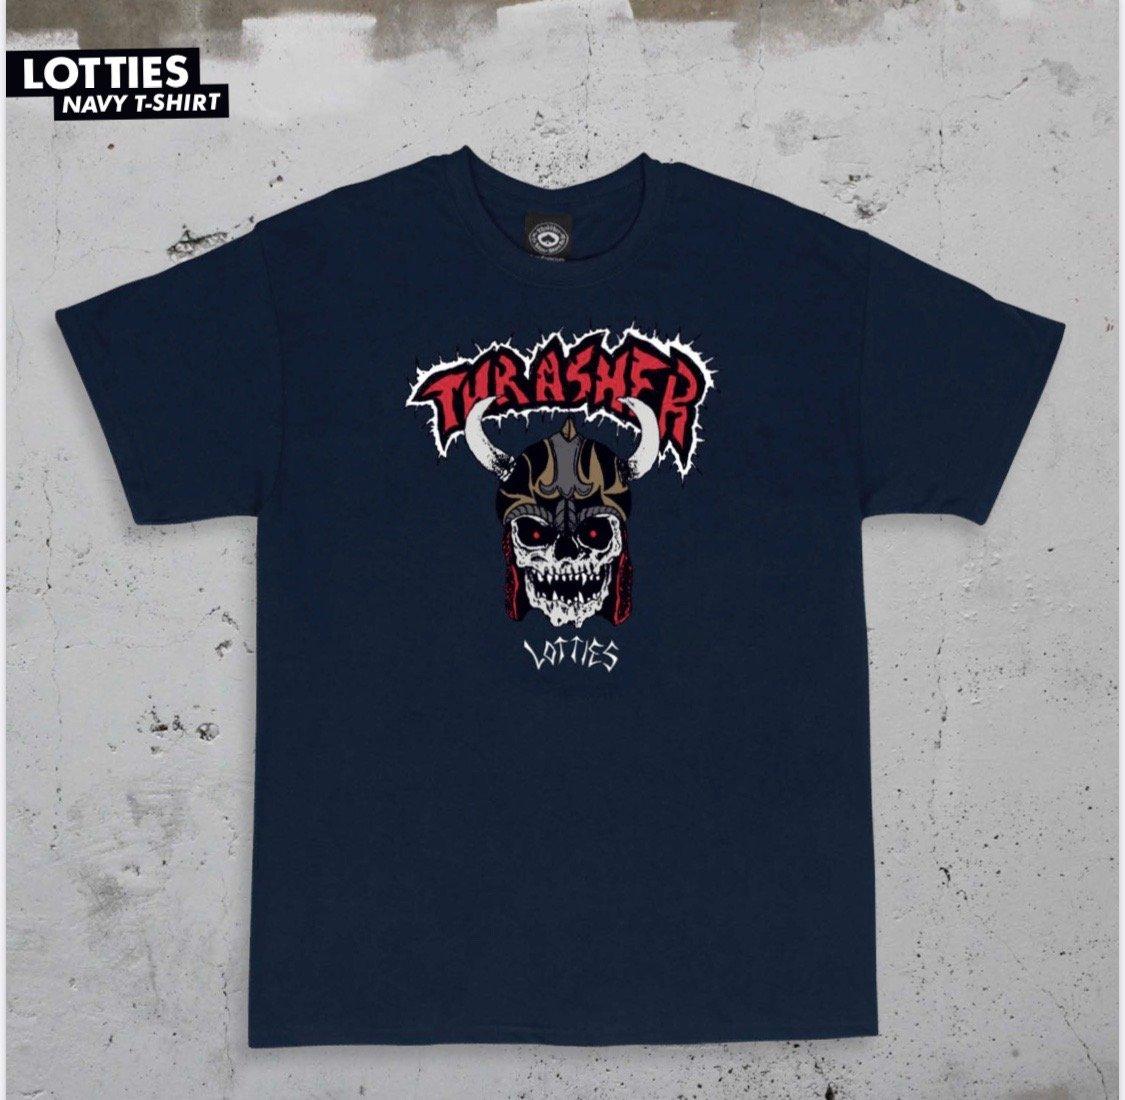 Thrasher x Lotties s/s t shirt navy